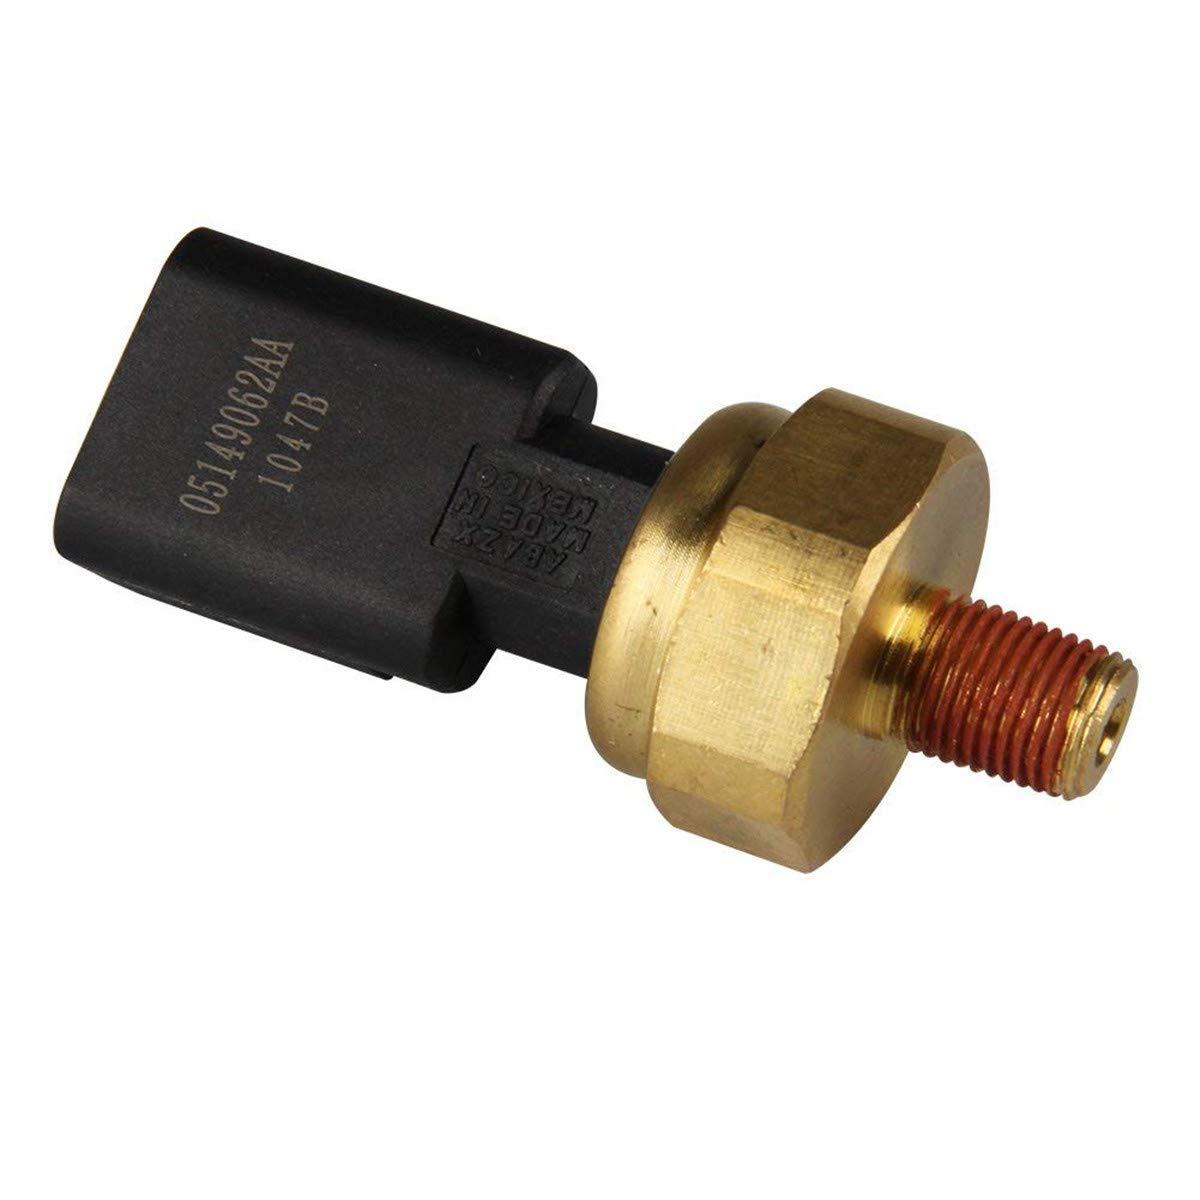 Amhousejoy 05149062AA Oil Pressure Sensor Switch fit for Chrysler Dodge RAM Jeep Haocheng Parts Co. Ltd.